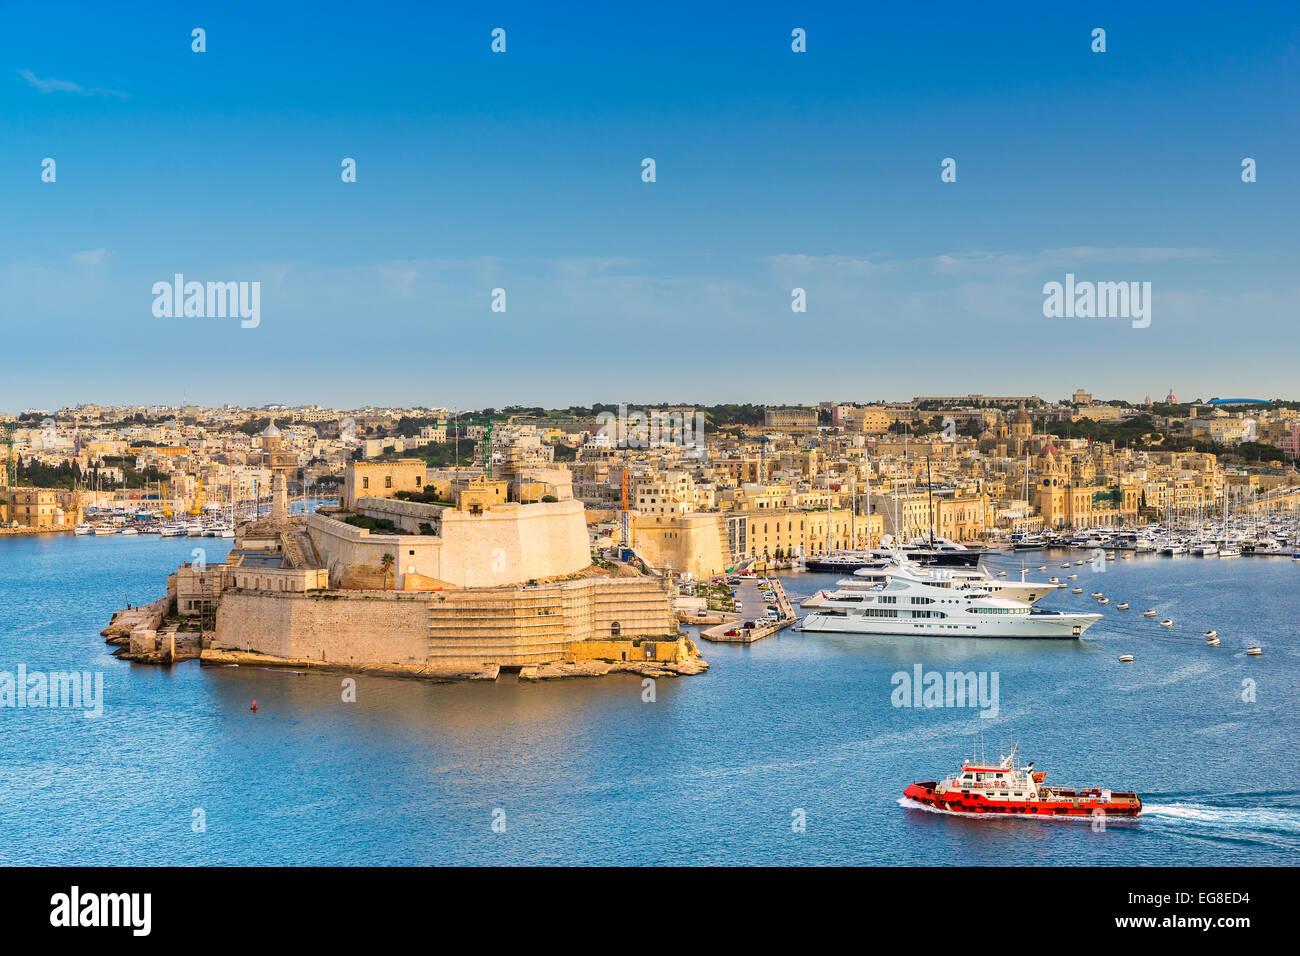 St Angelo Fort in Valletta - Stock Image